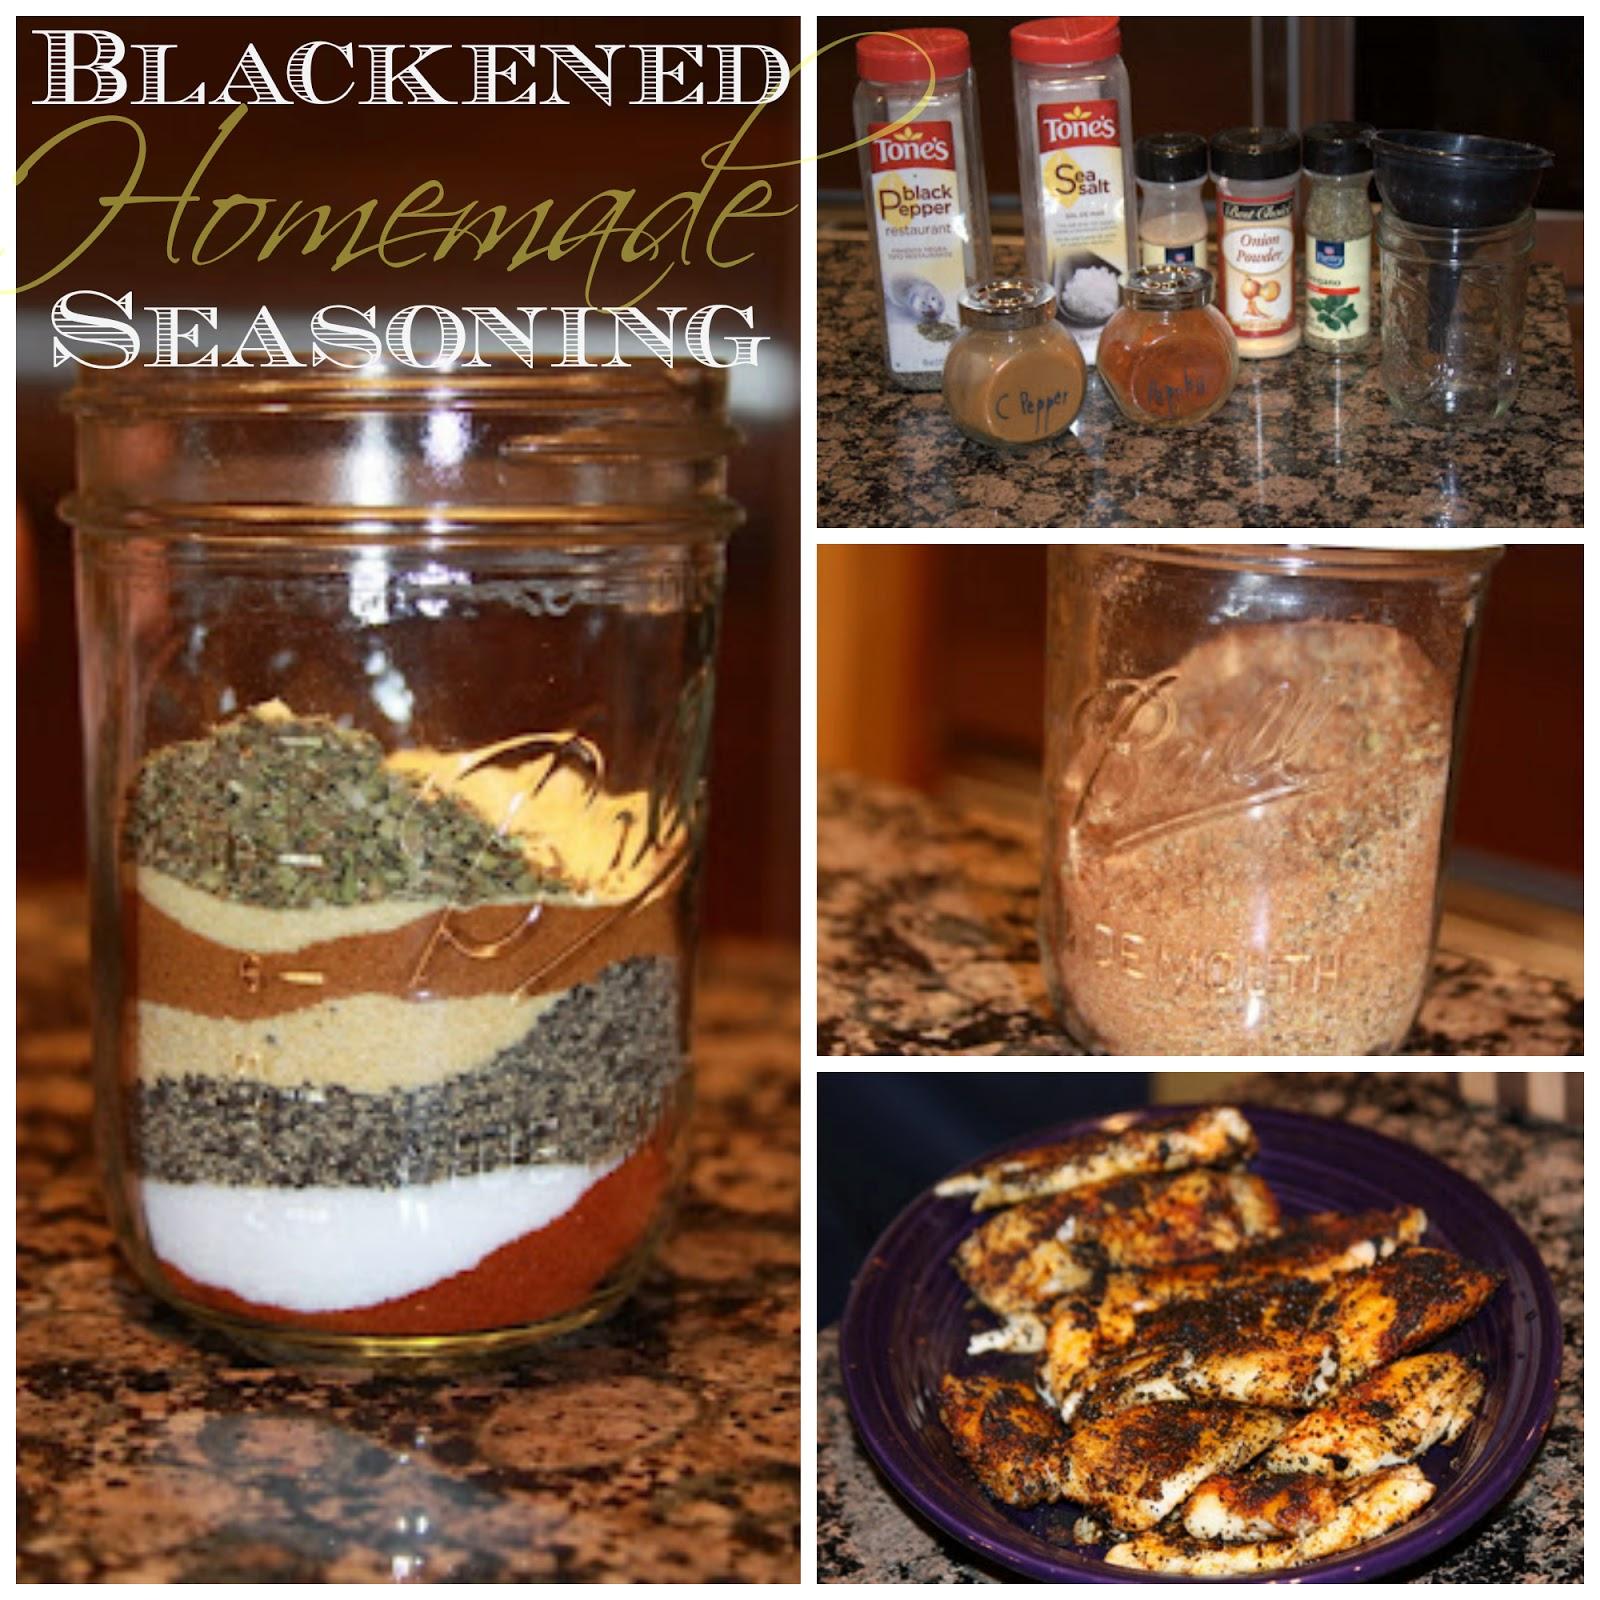 Blackened seasoning recipes we love for Blackened fish seasoning